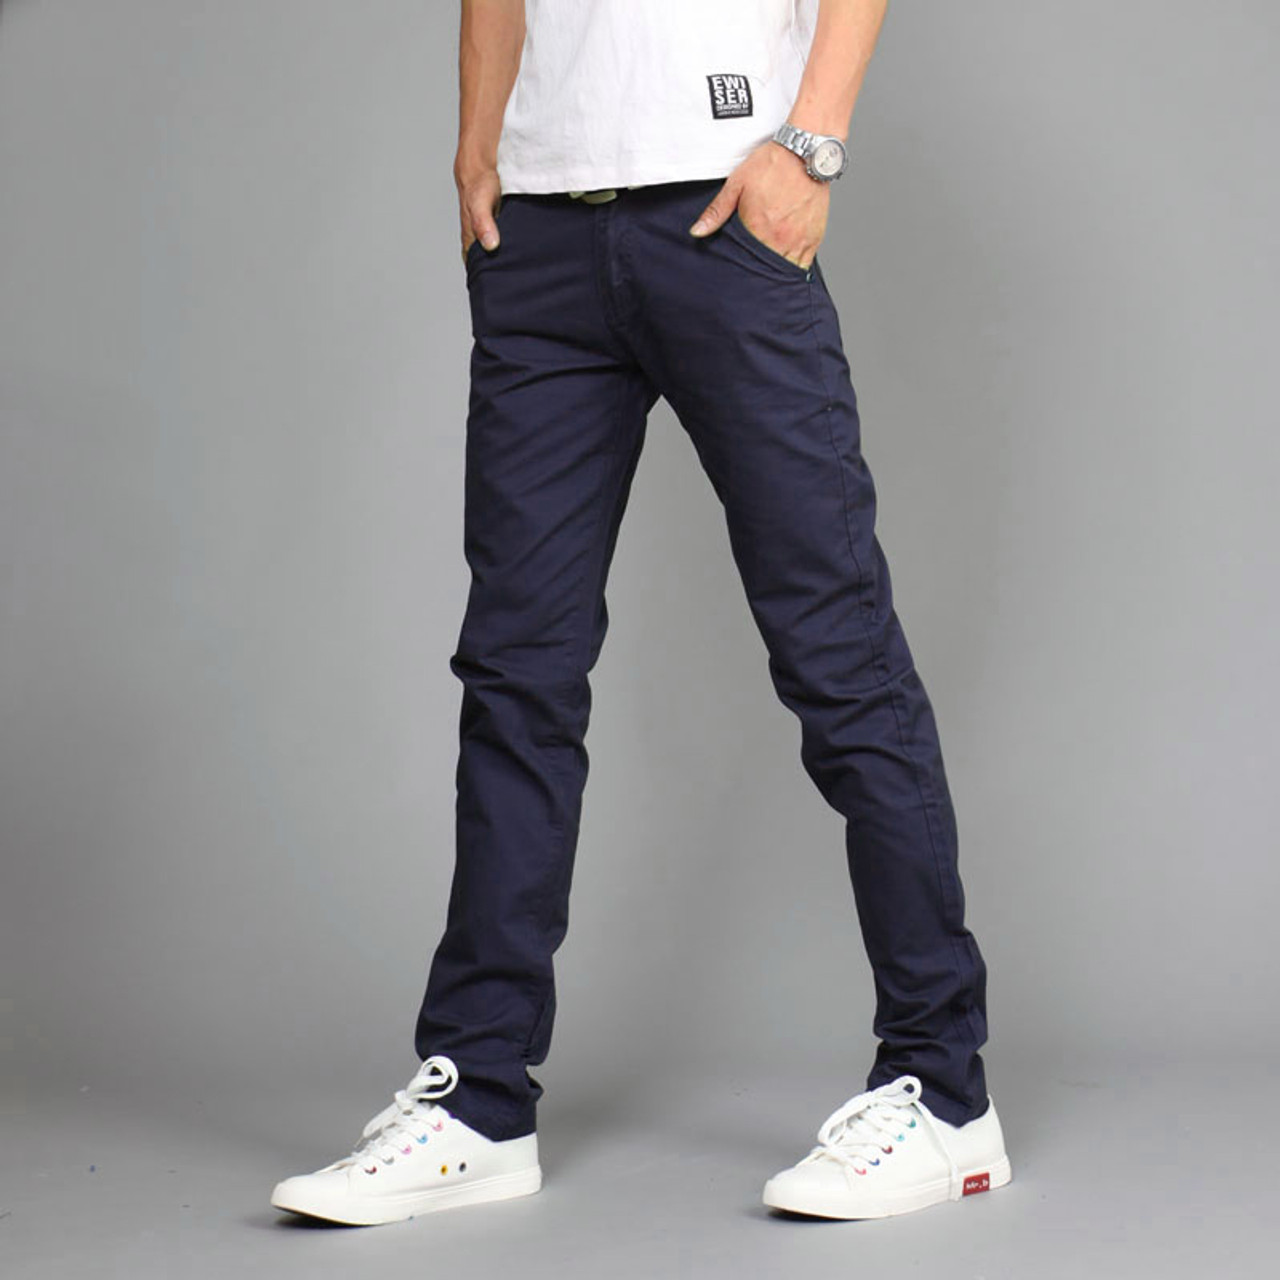 bcc7b3a47bd33 ... 2017 New Design Casual Men Pants Cotton Slim Pant Straight Trousers  Fashion Business Solid Khaki Black ...